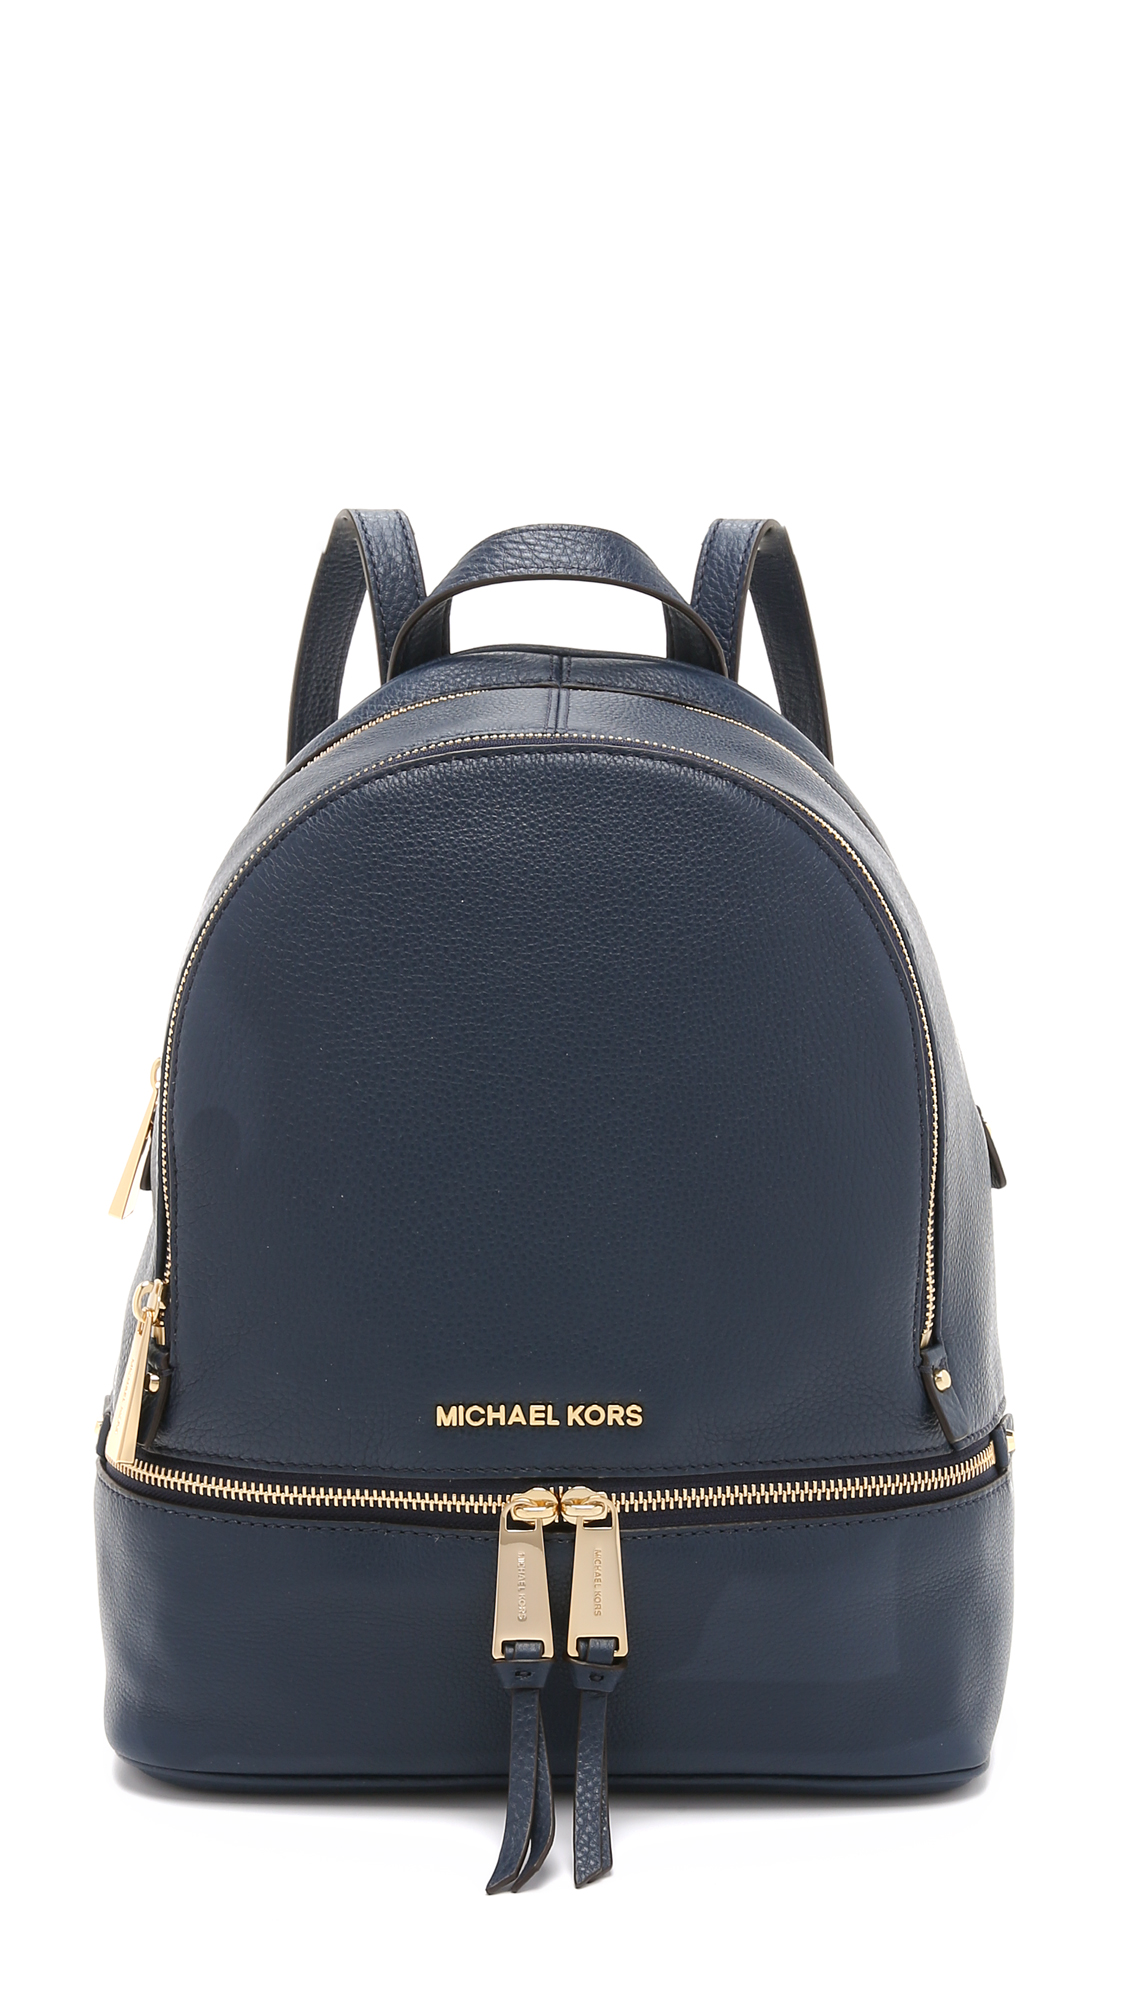 Michael Michael Kors Extra Small Rhea Zip Backpack In Blue   ModeSens 1cd42b8af9